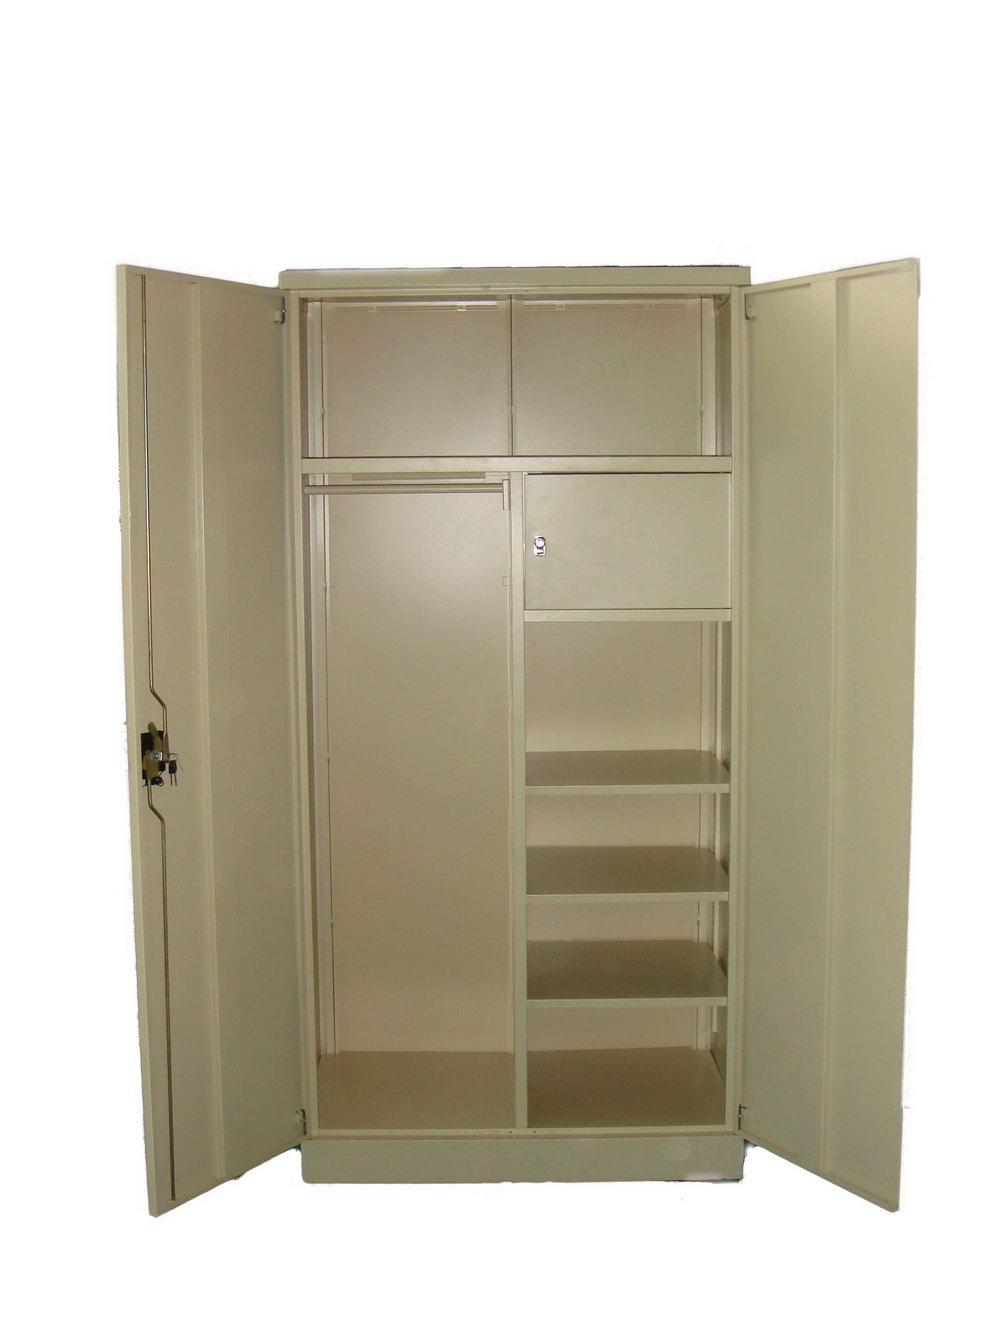 Storage Cabinet Plans Free